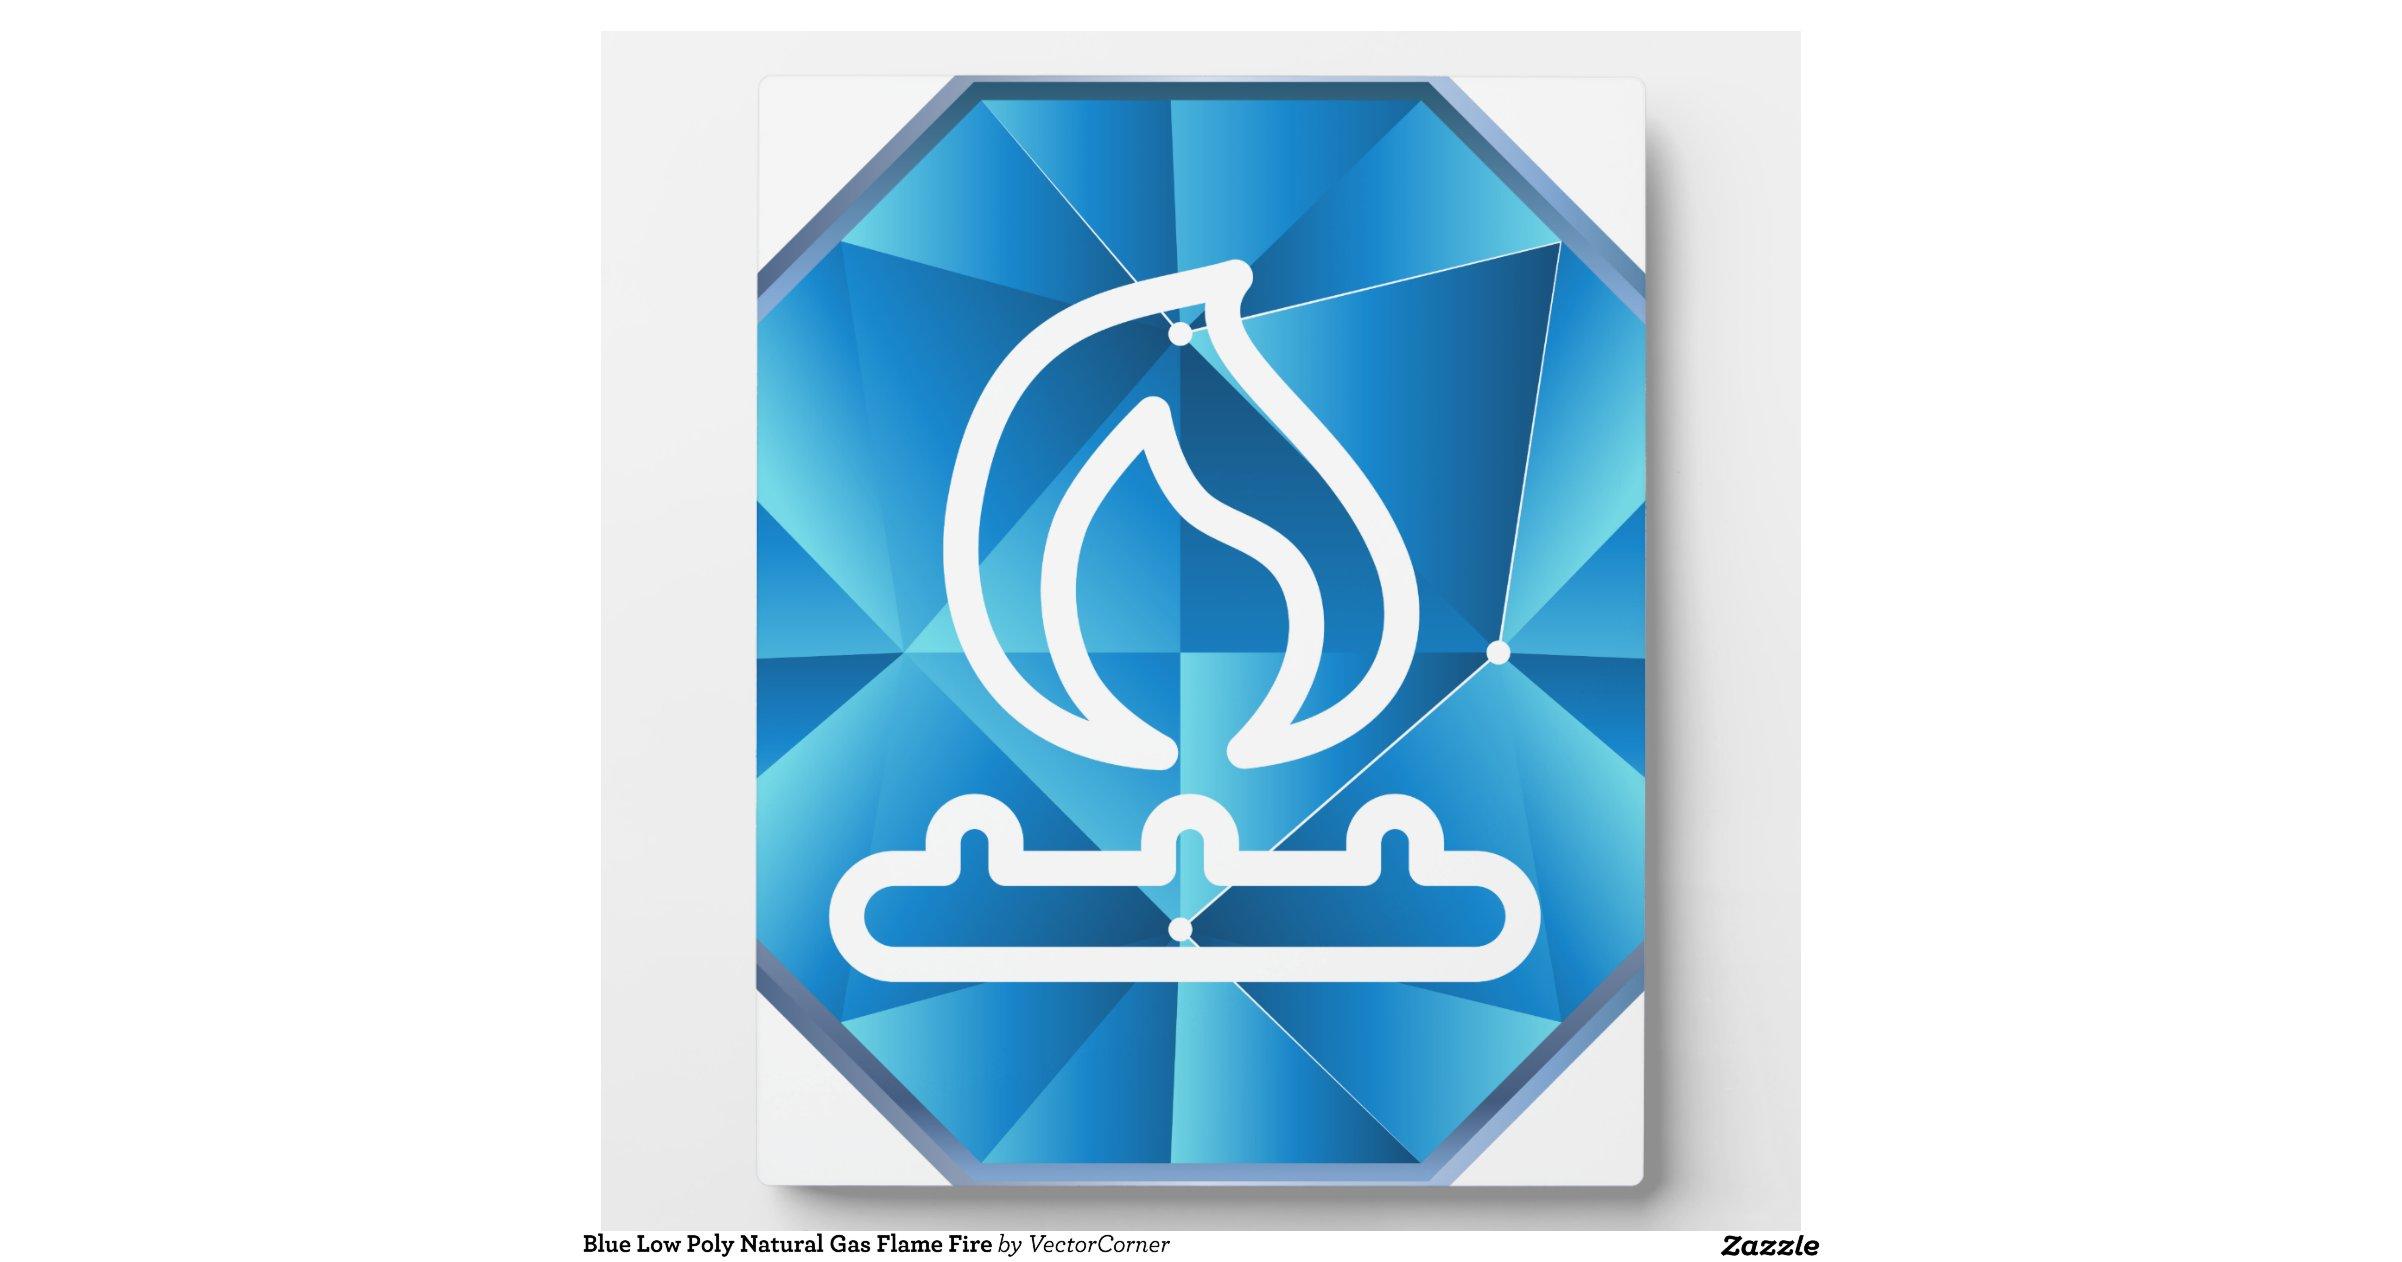 Blue Low Poly Natural Gas Flame Fire Plaques Zazzle